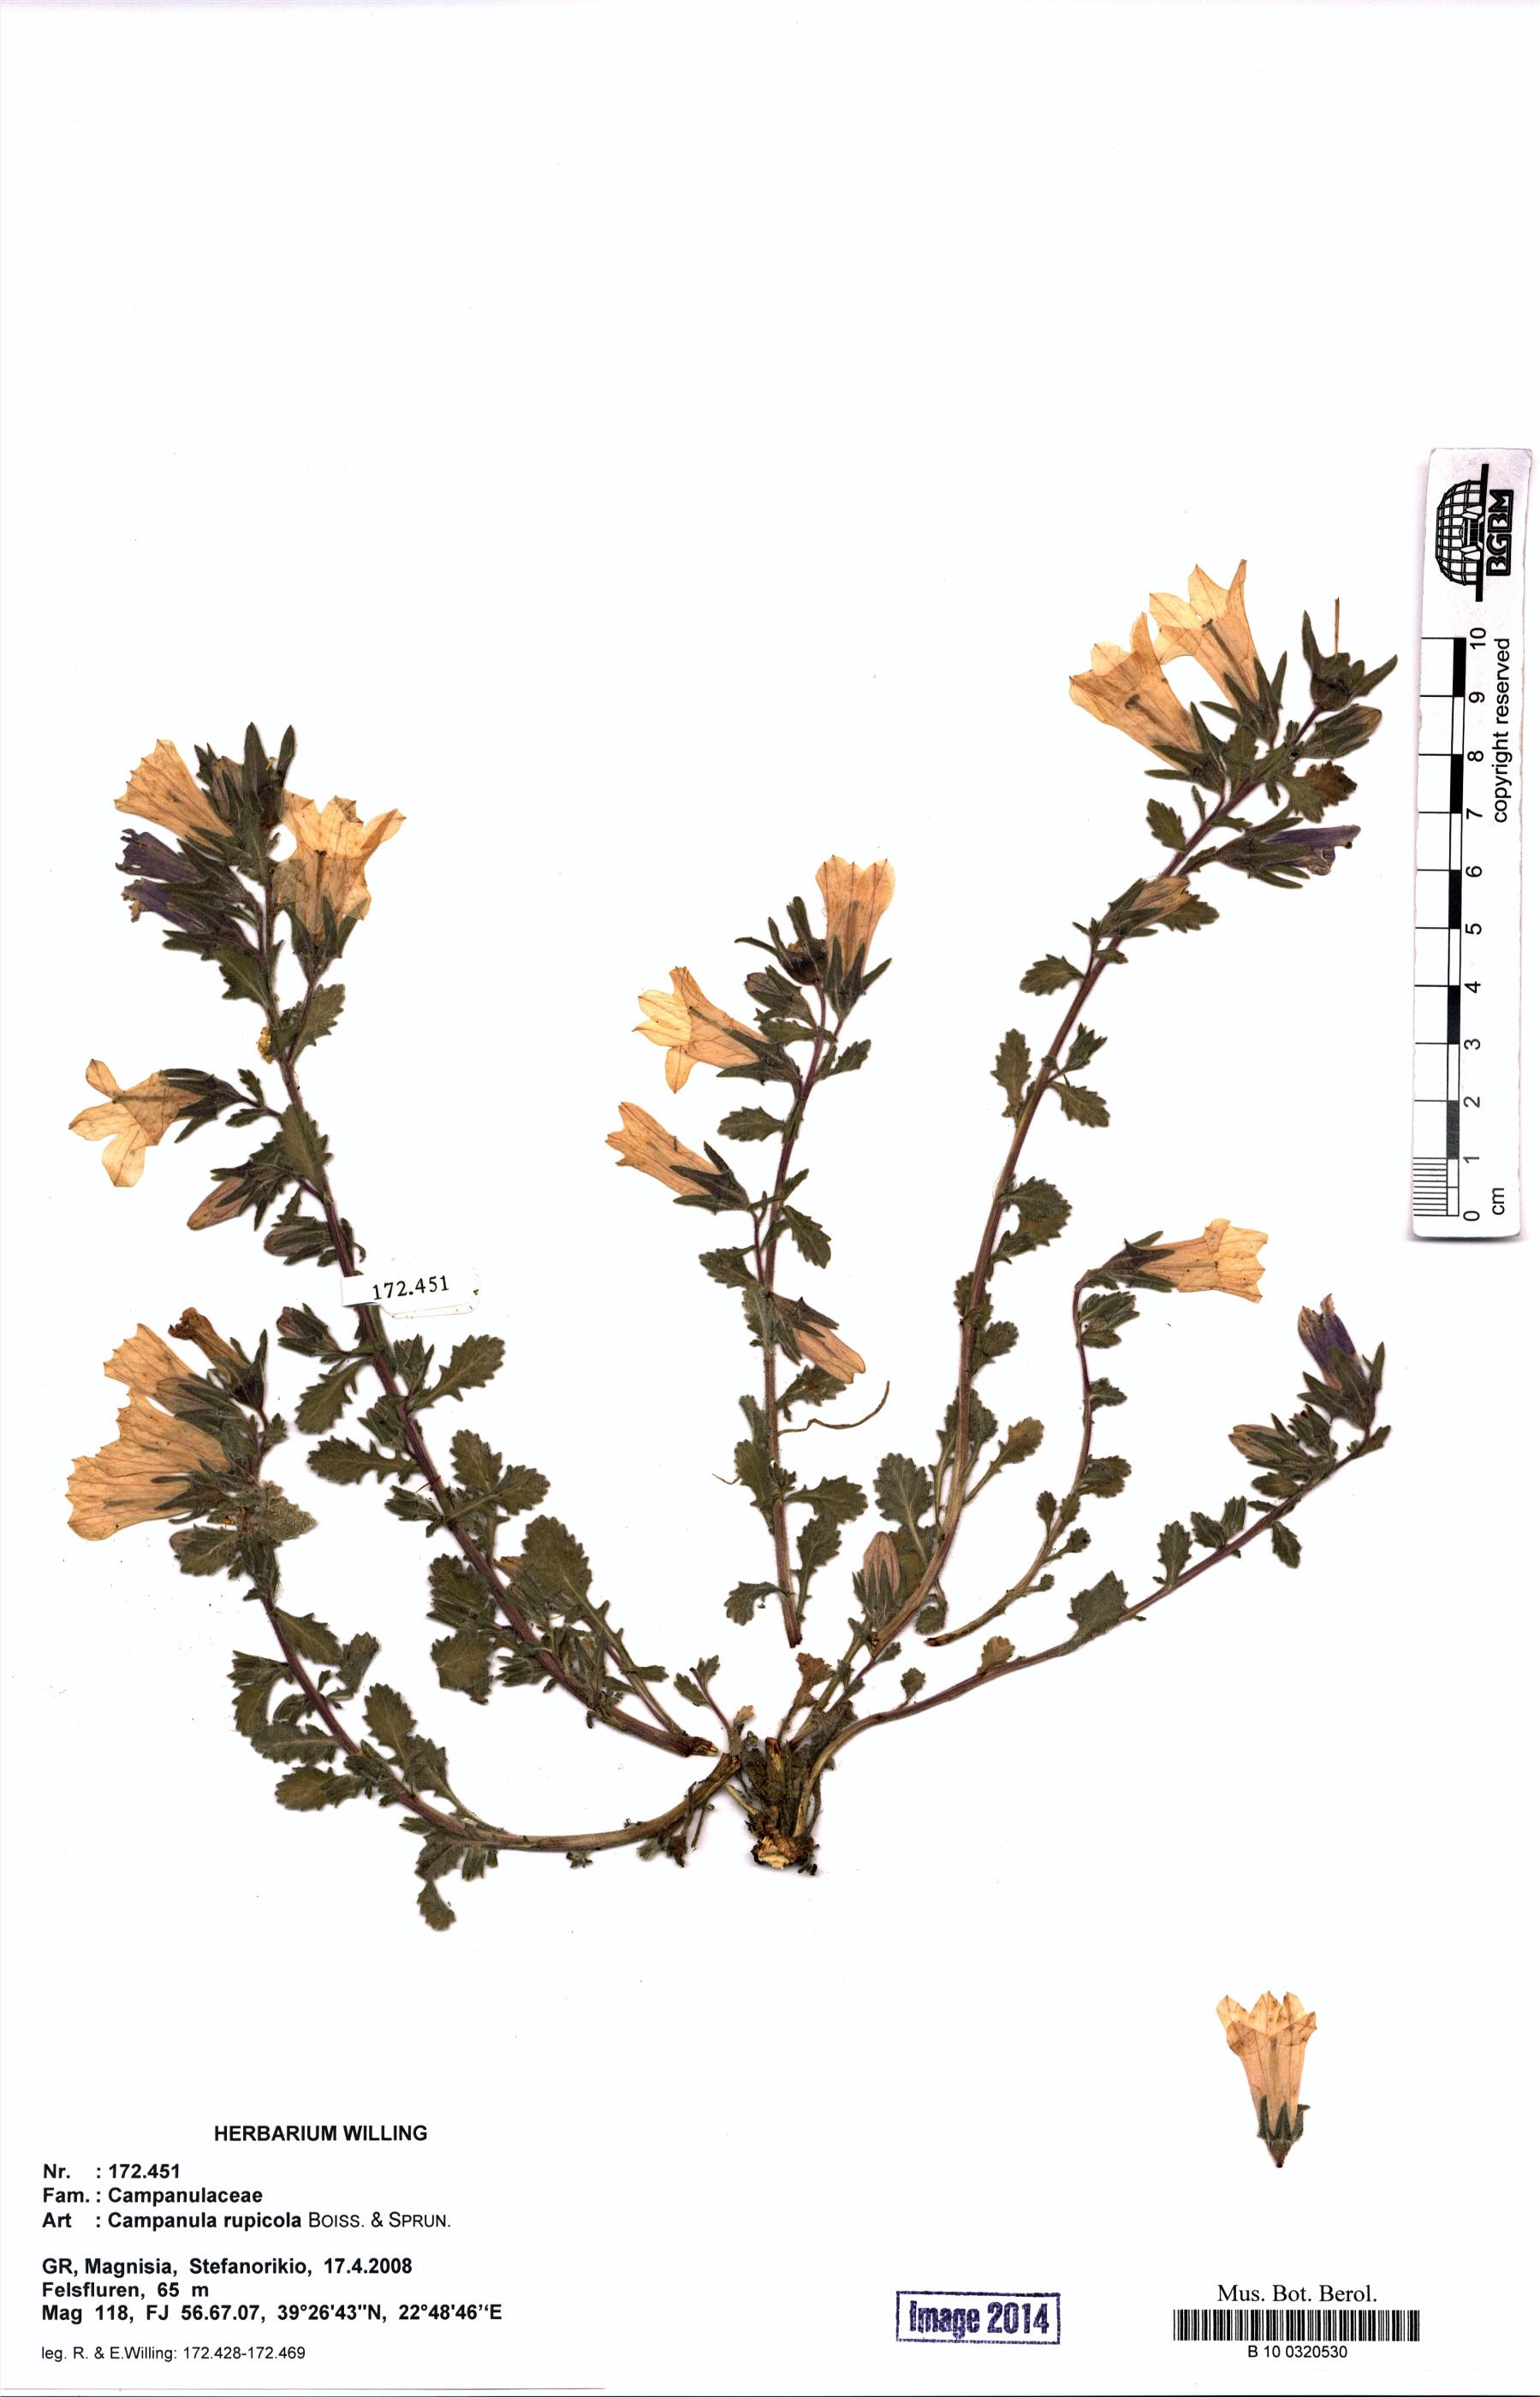 http://ww2.bgbm.org/herbarium/images/B/10/03/20/53/B_10_0320530.jpg